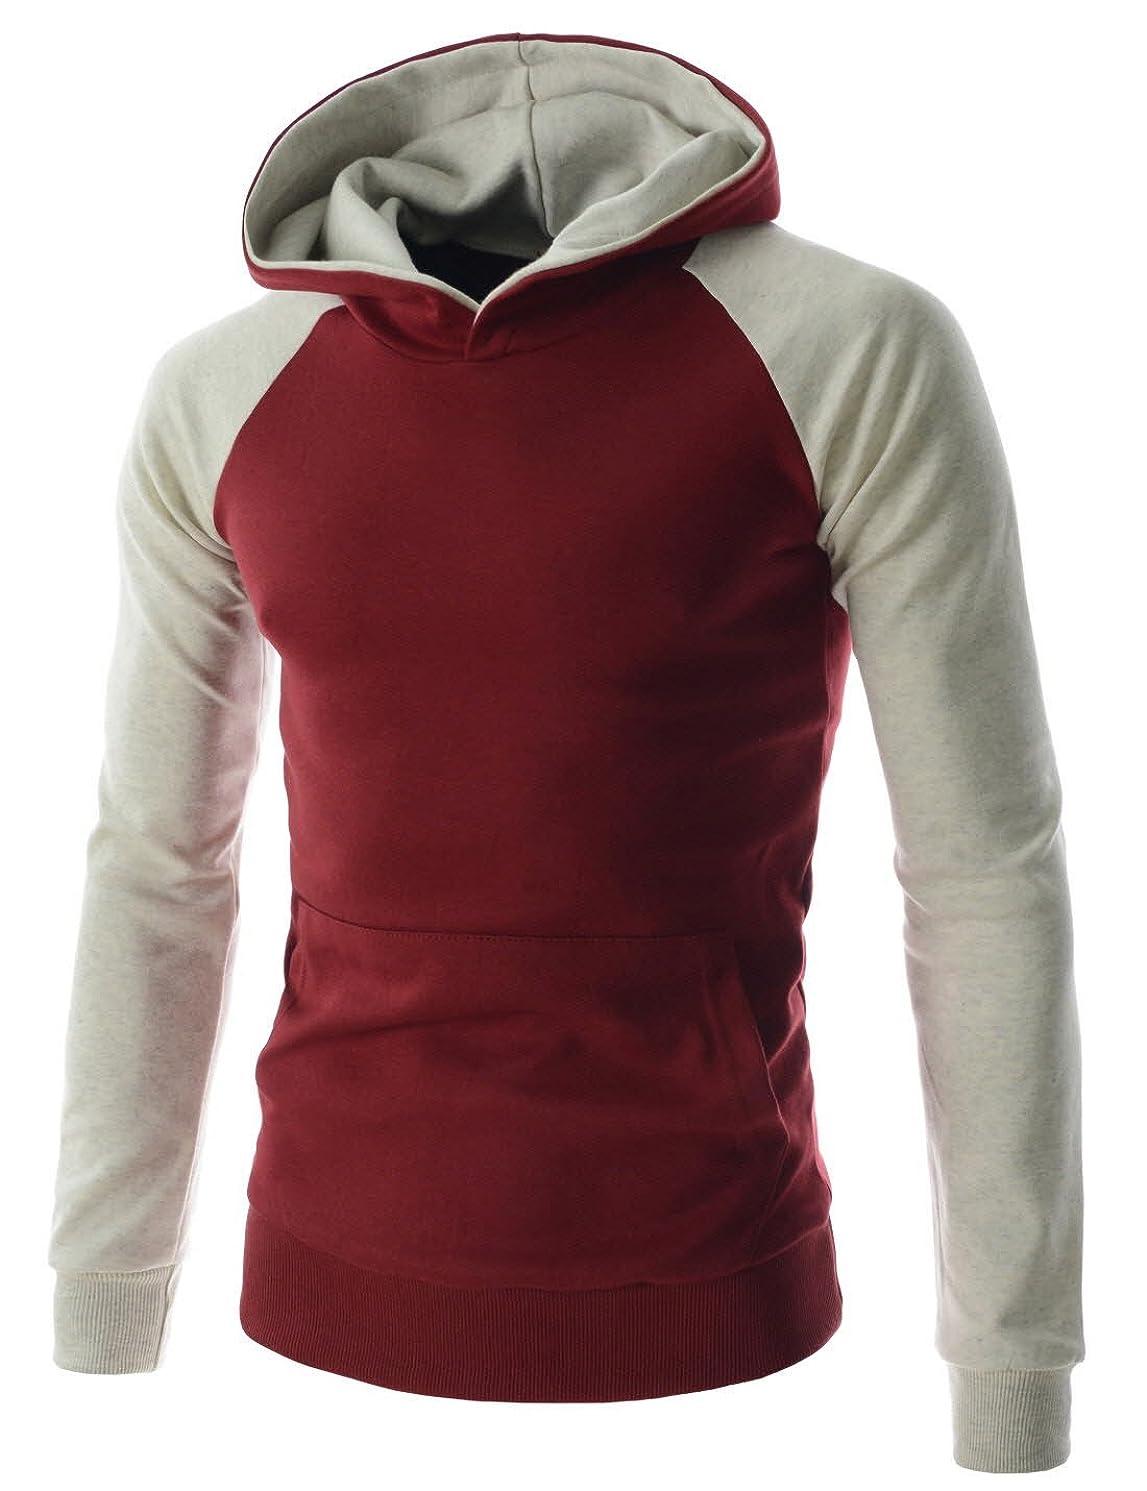 (MBH01) Men Contrast Raglan Hoodie String Connect Pocket Long Sleeve Tshirts